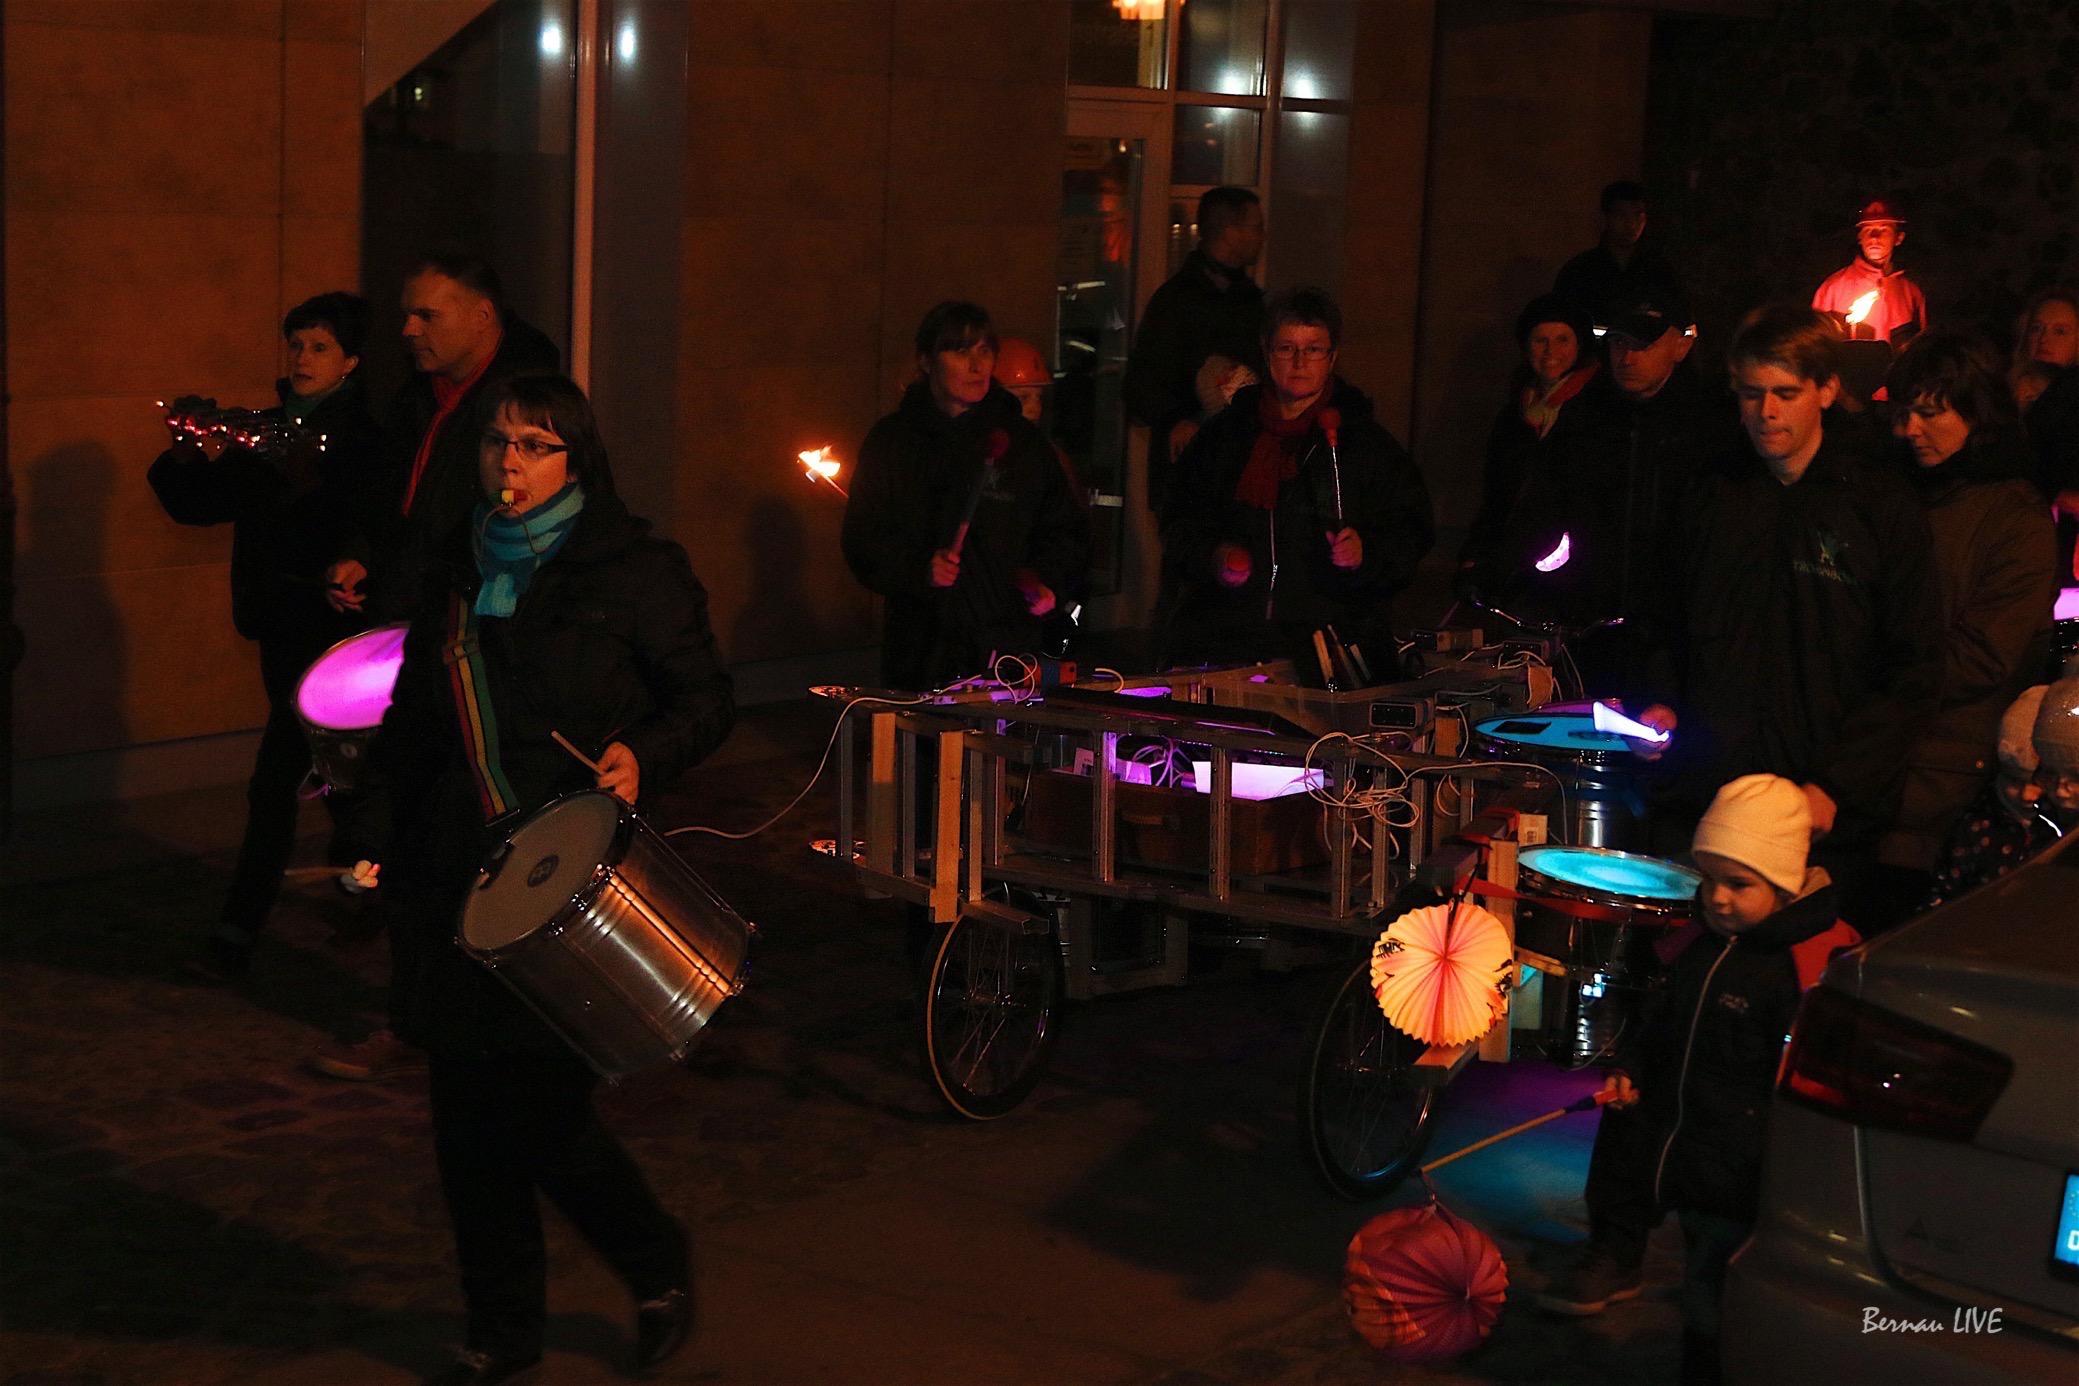 Bernau: Laternenumzug in Friedenstal: Bitte langsam fahren